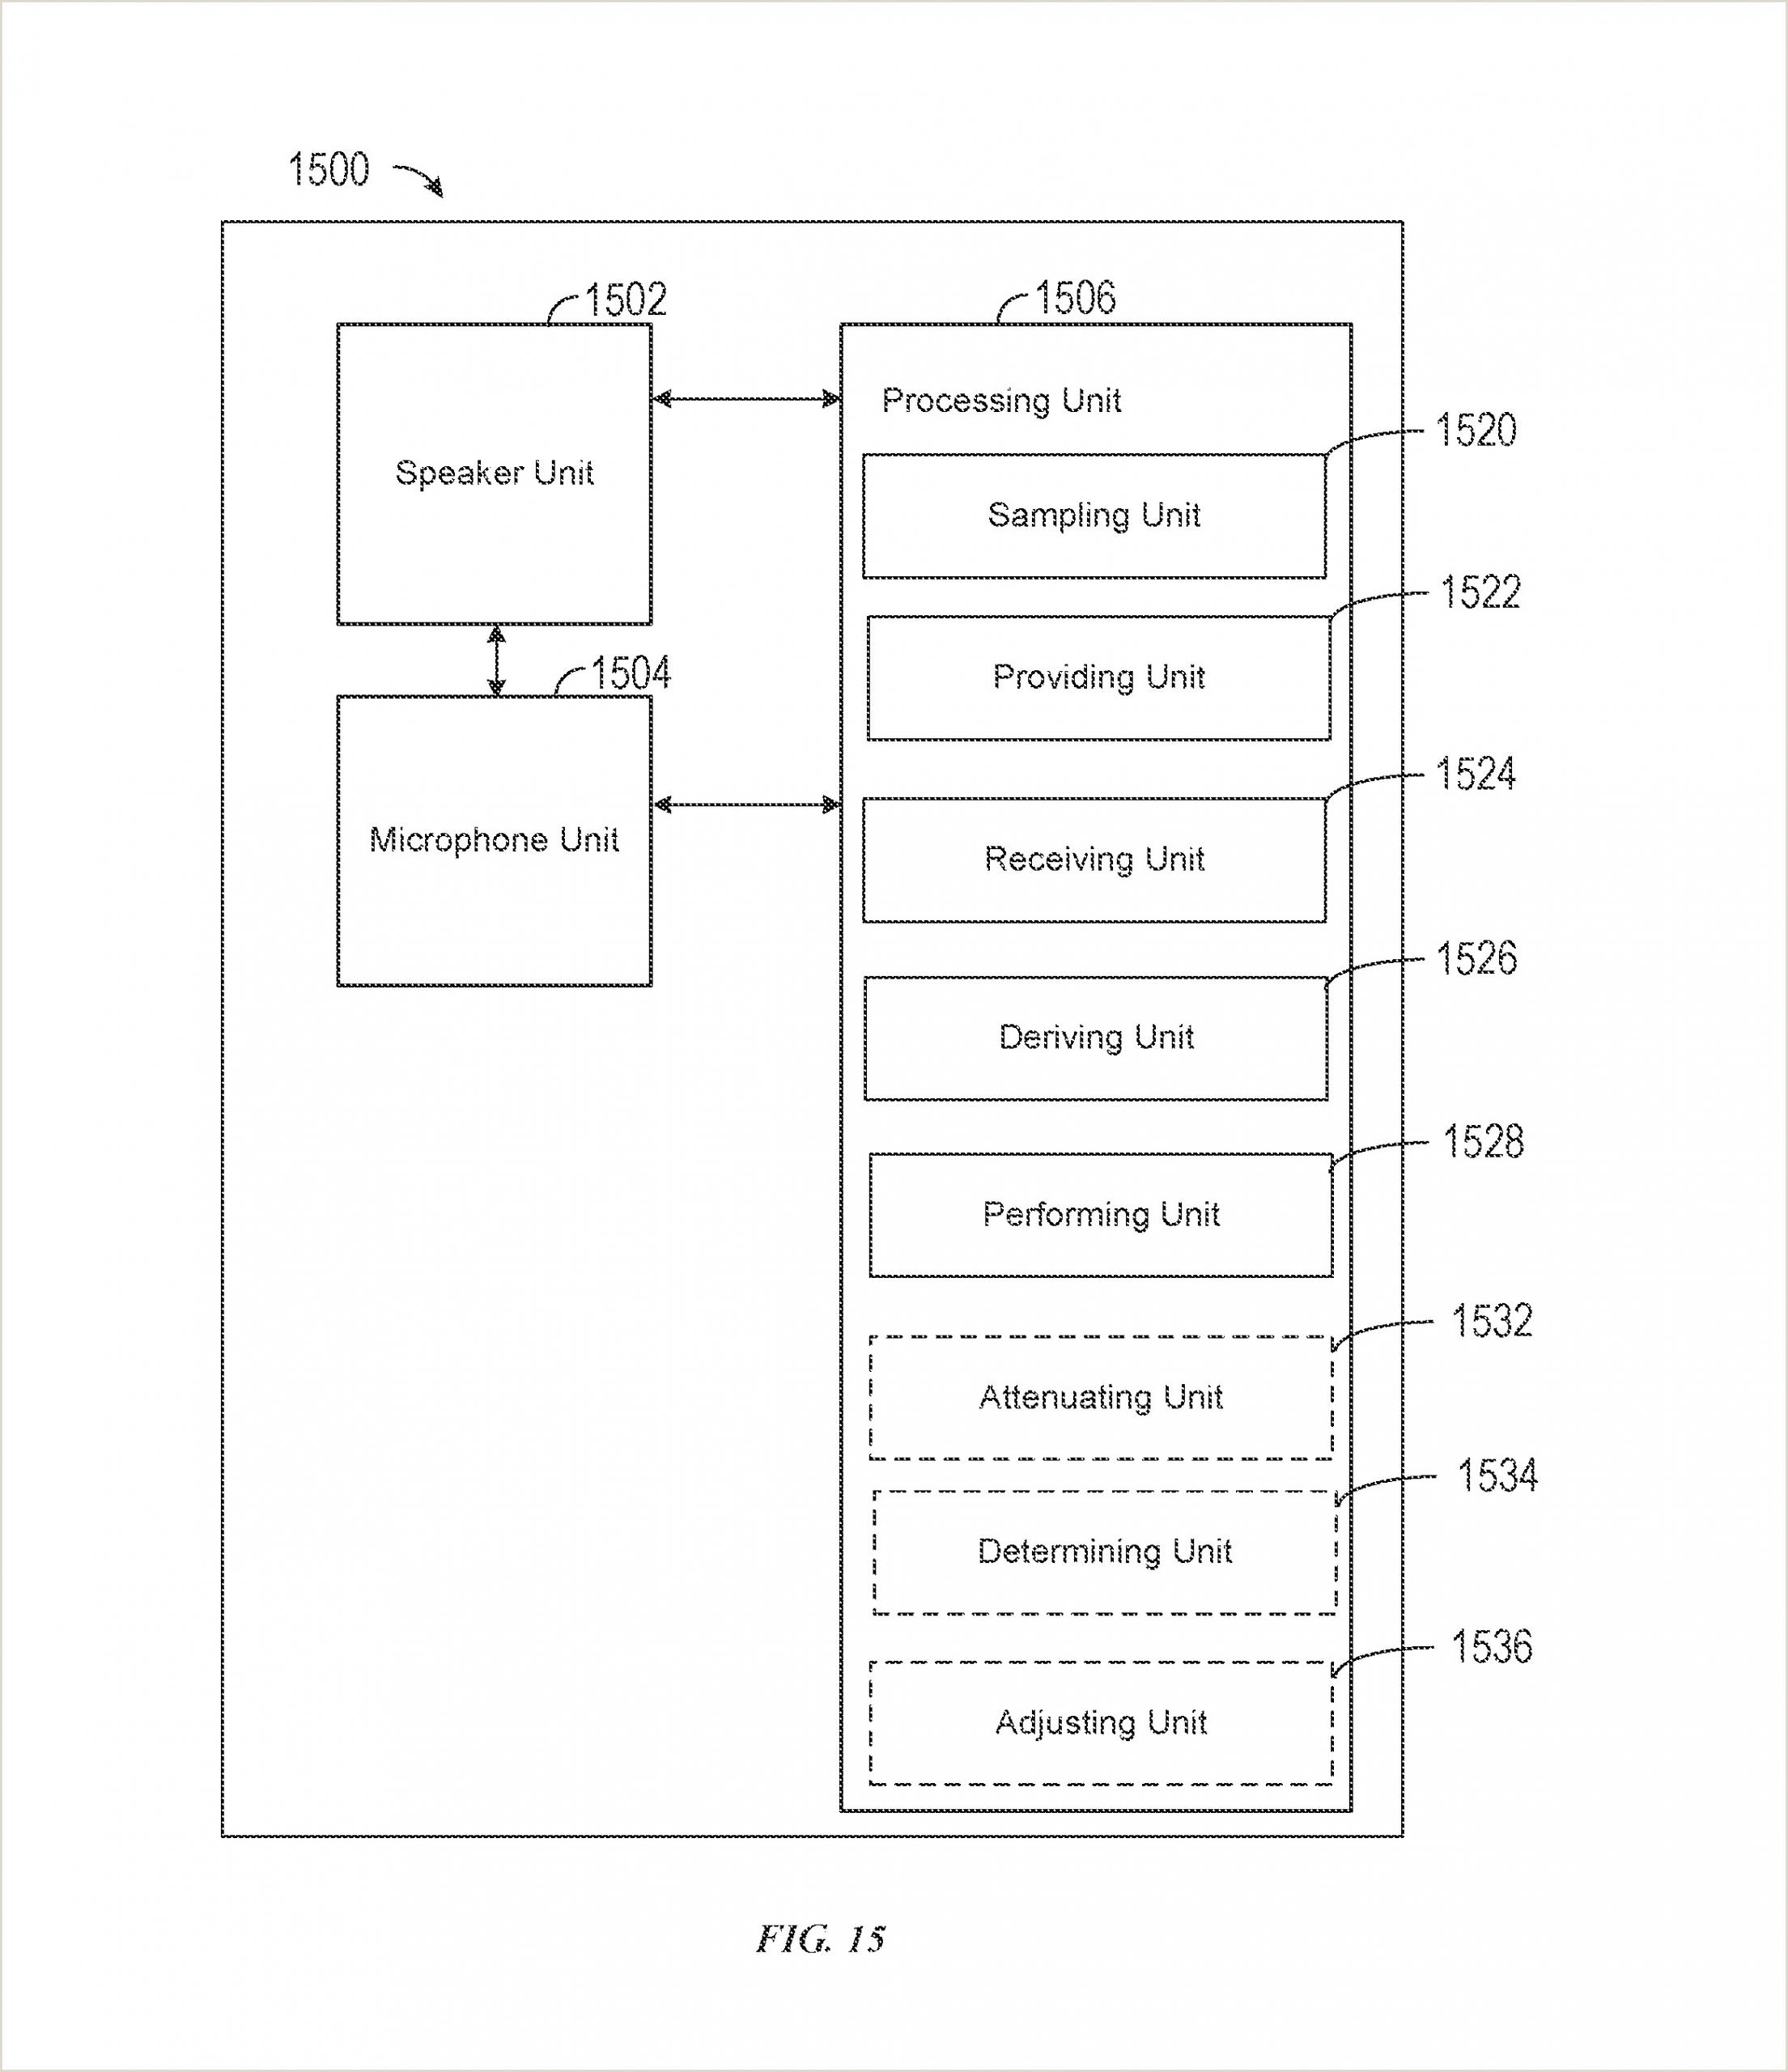 Unique Medi Spa Business Cards Us B2 Intelligent Automated Assistant Google Patents